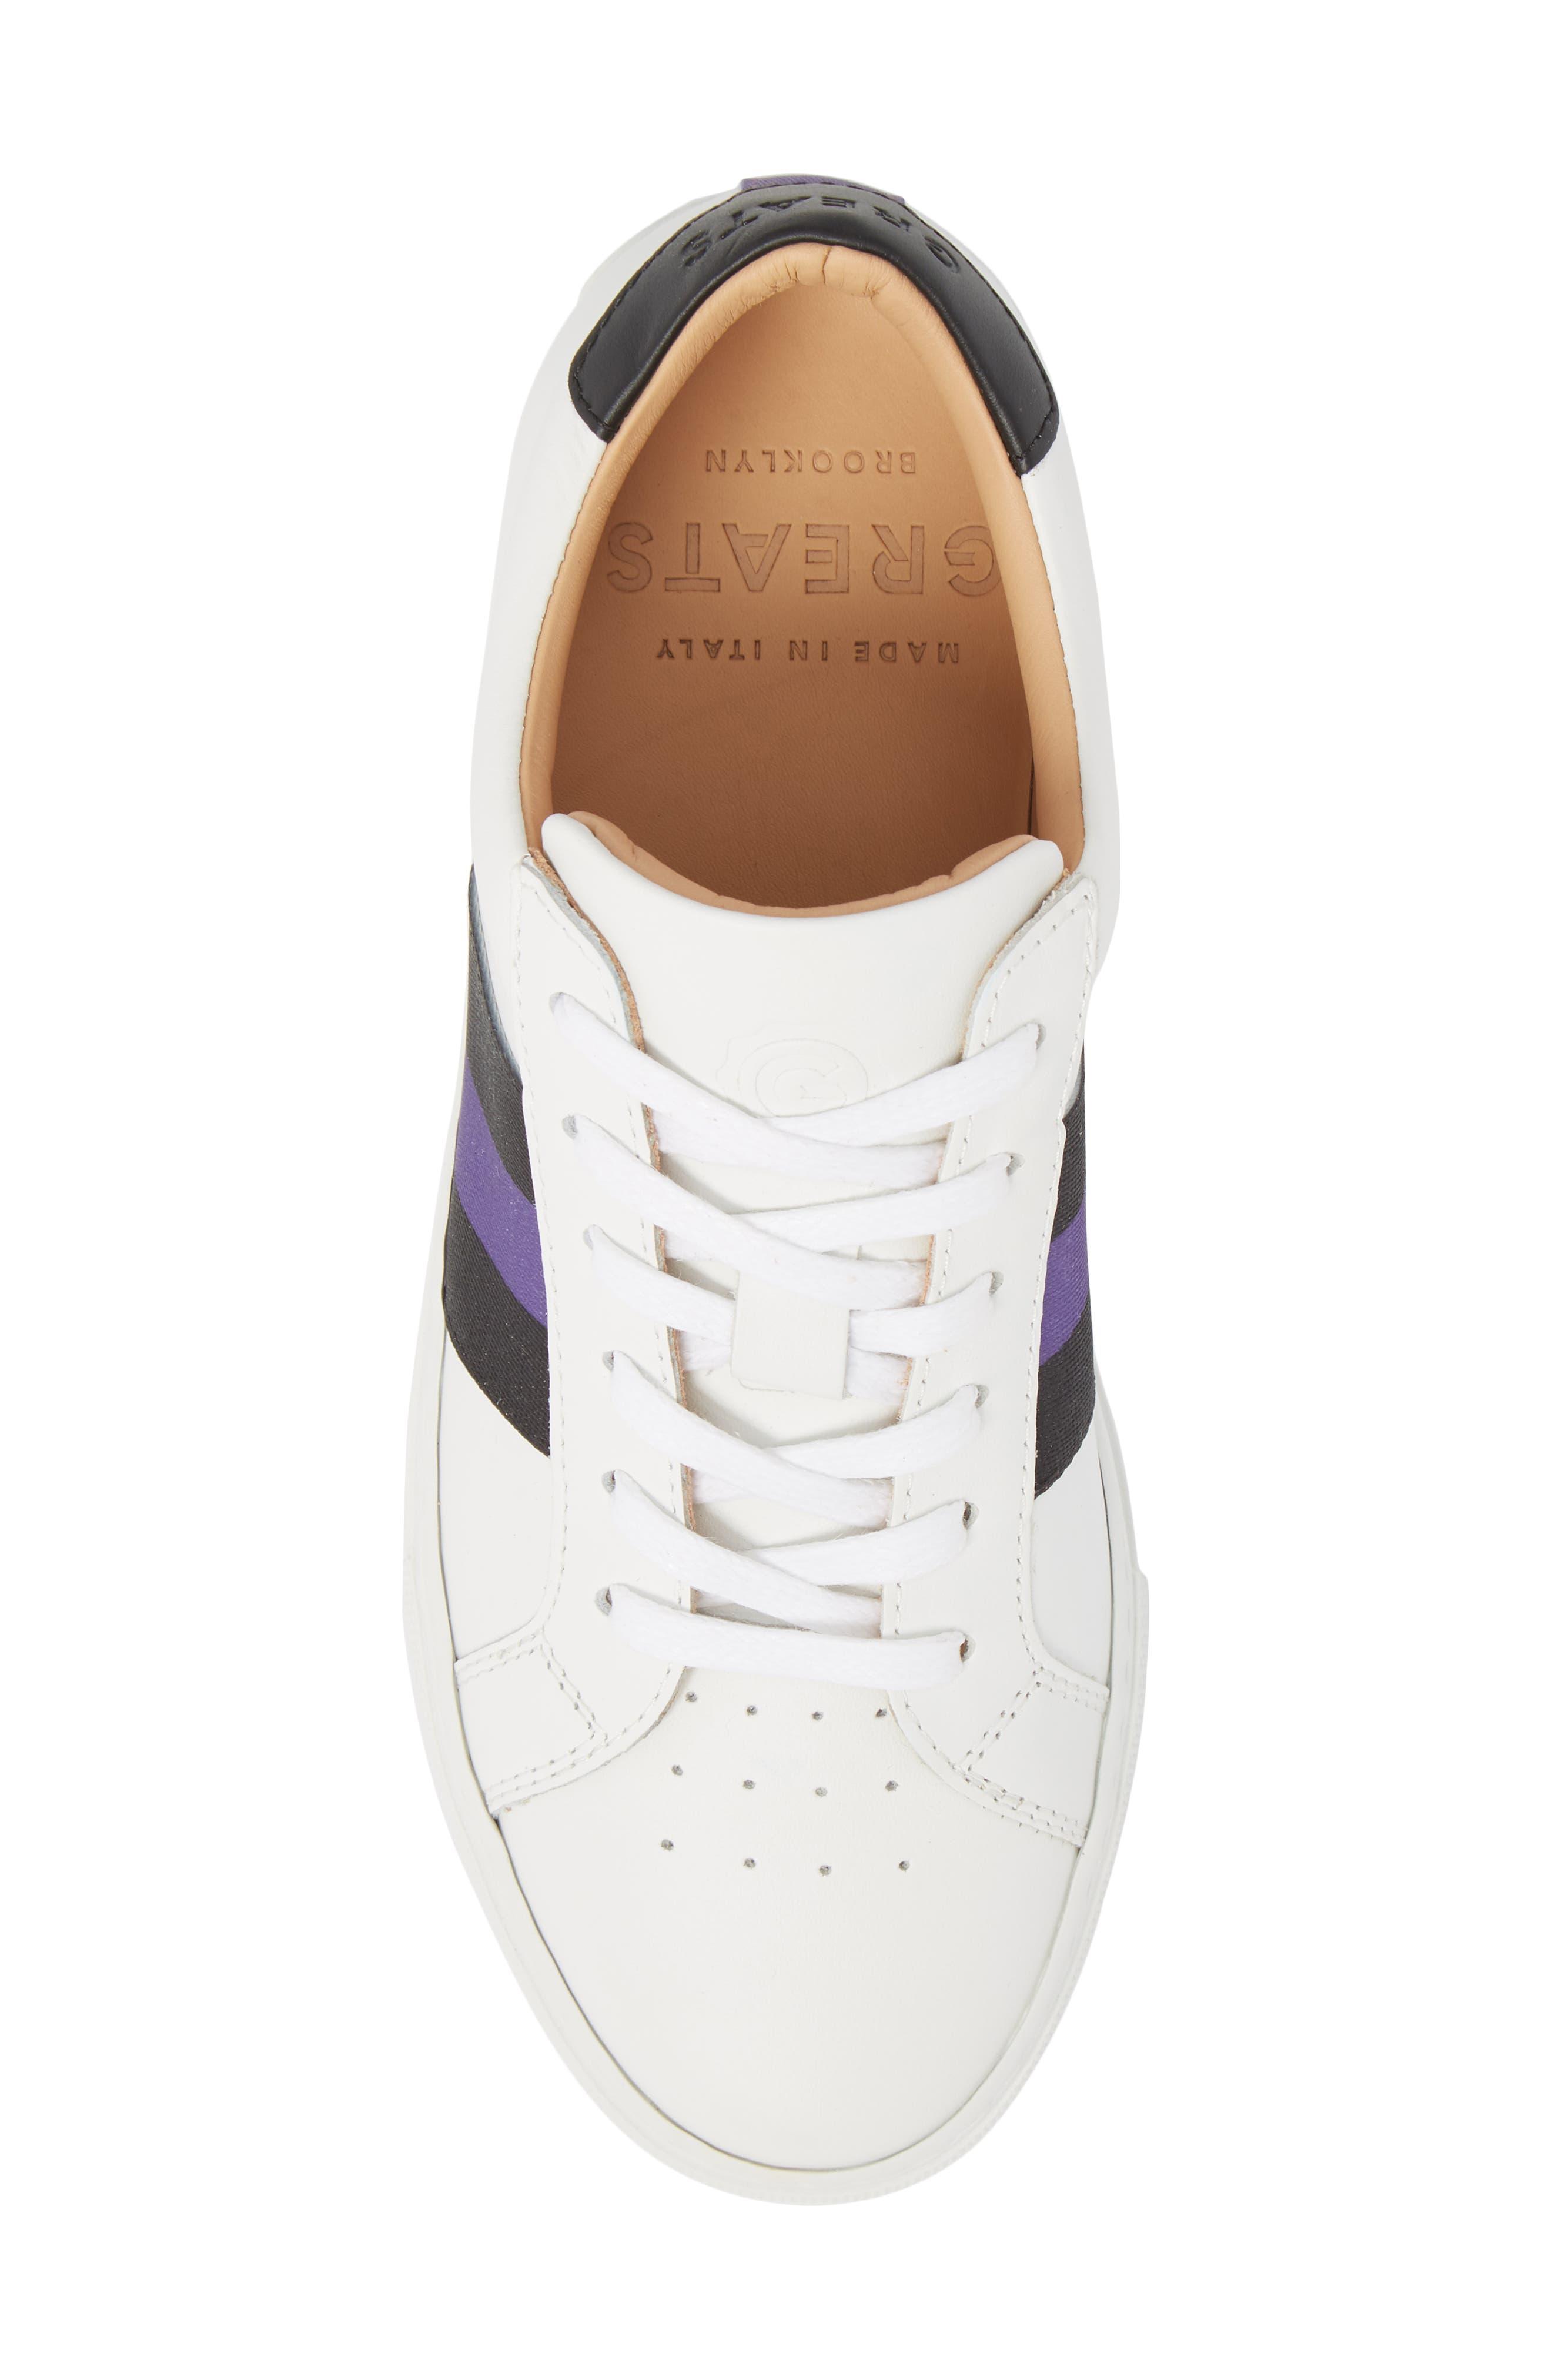 Royale Stripe Sneaker,                             Alternate thumbnail 5, color,                             WHITE/ BLACK/ VIOLET